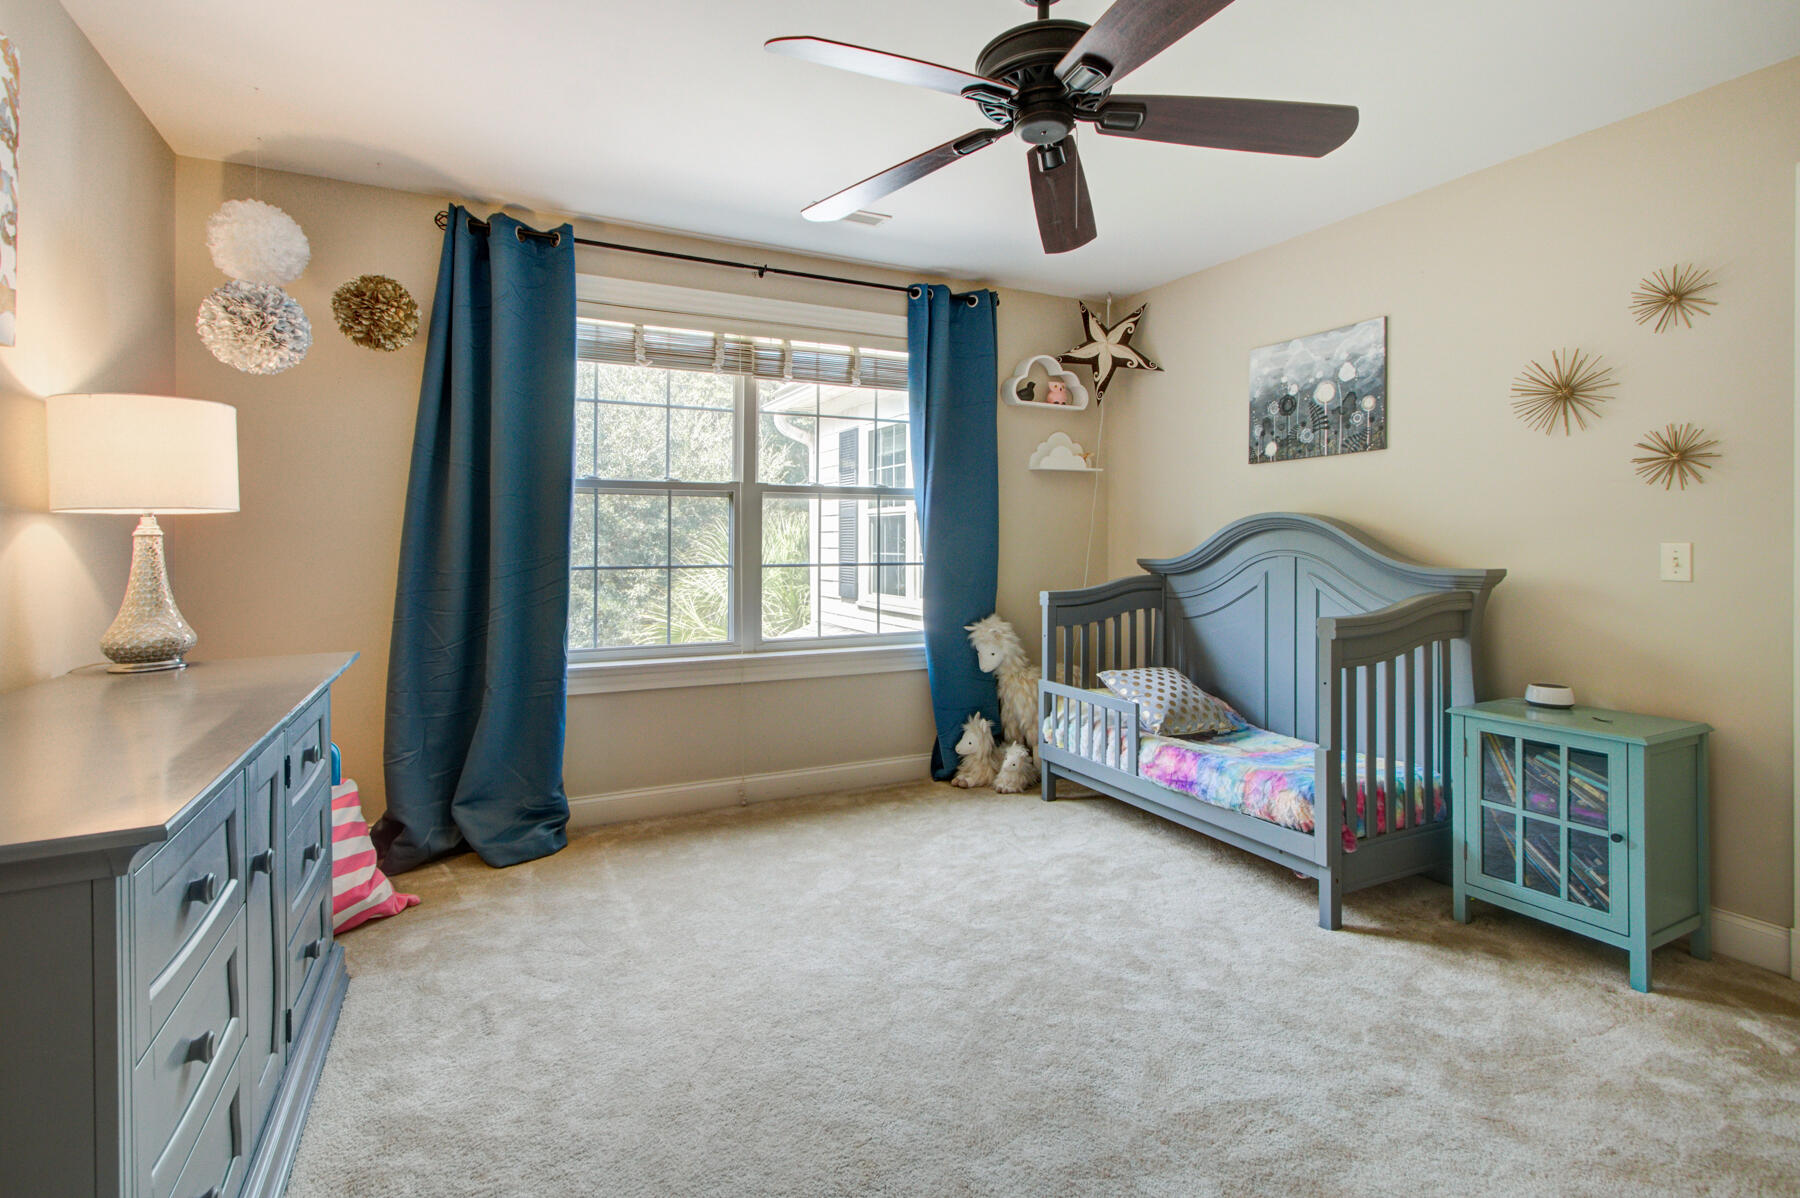 Dunes West Homes For Sale - 3095 Pignatelli, Mount Pleasant, SC - 3